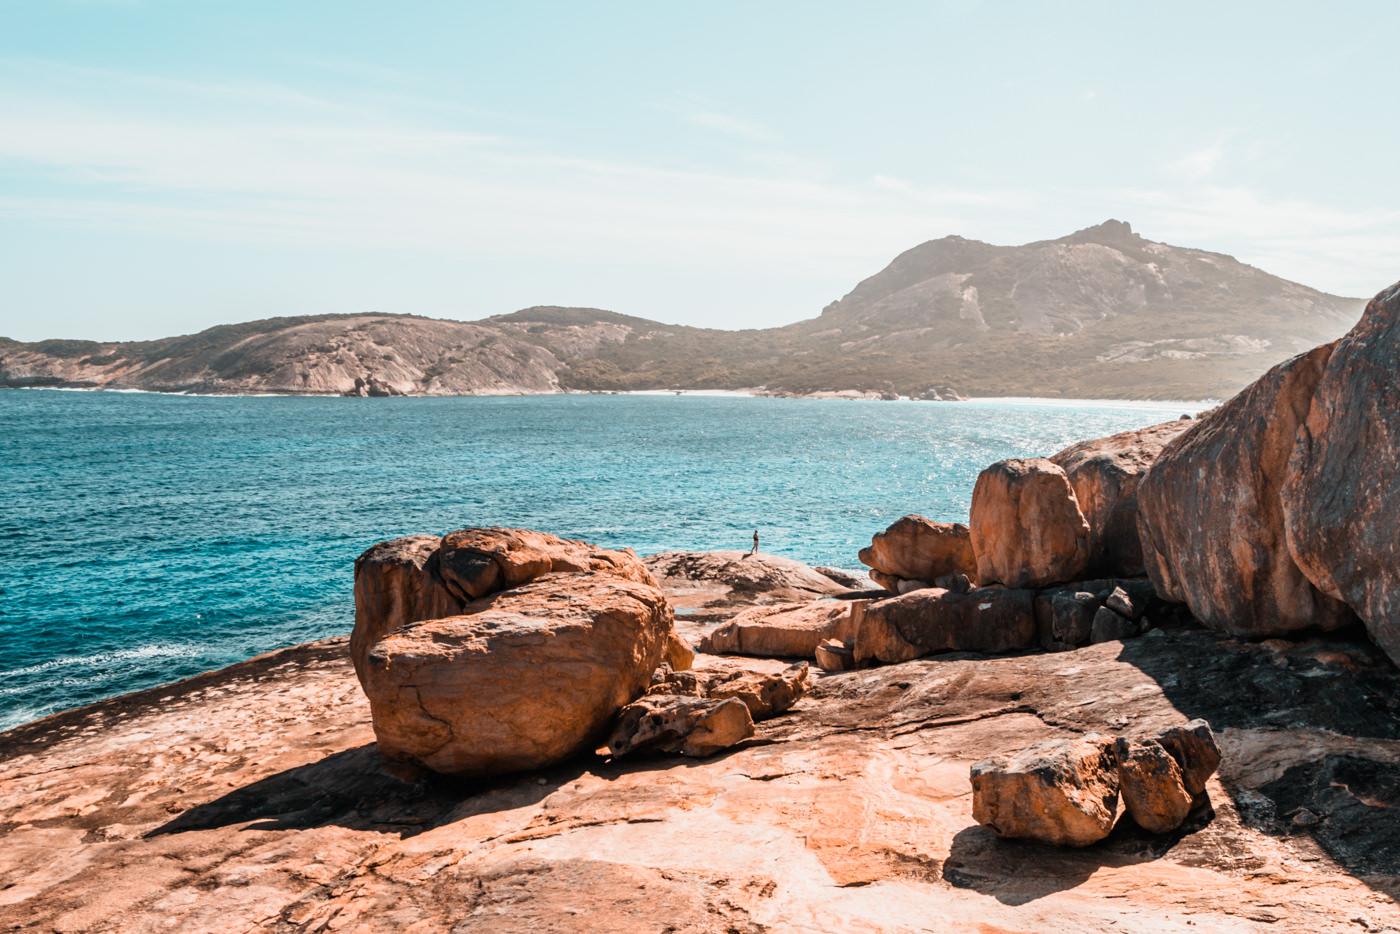 Küste im Cape Le Grande Nationalpark in Westaustralien